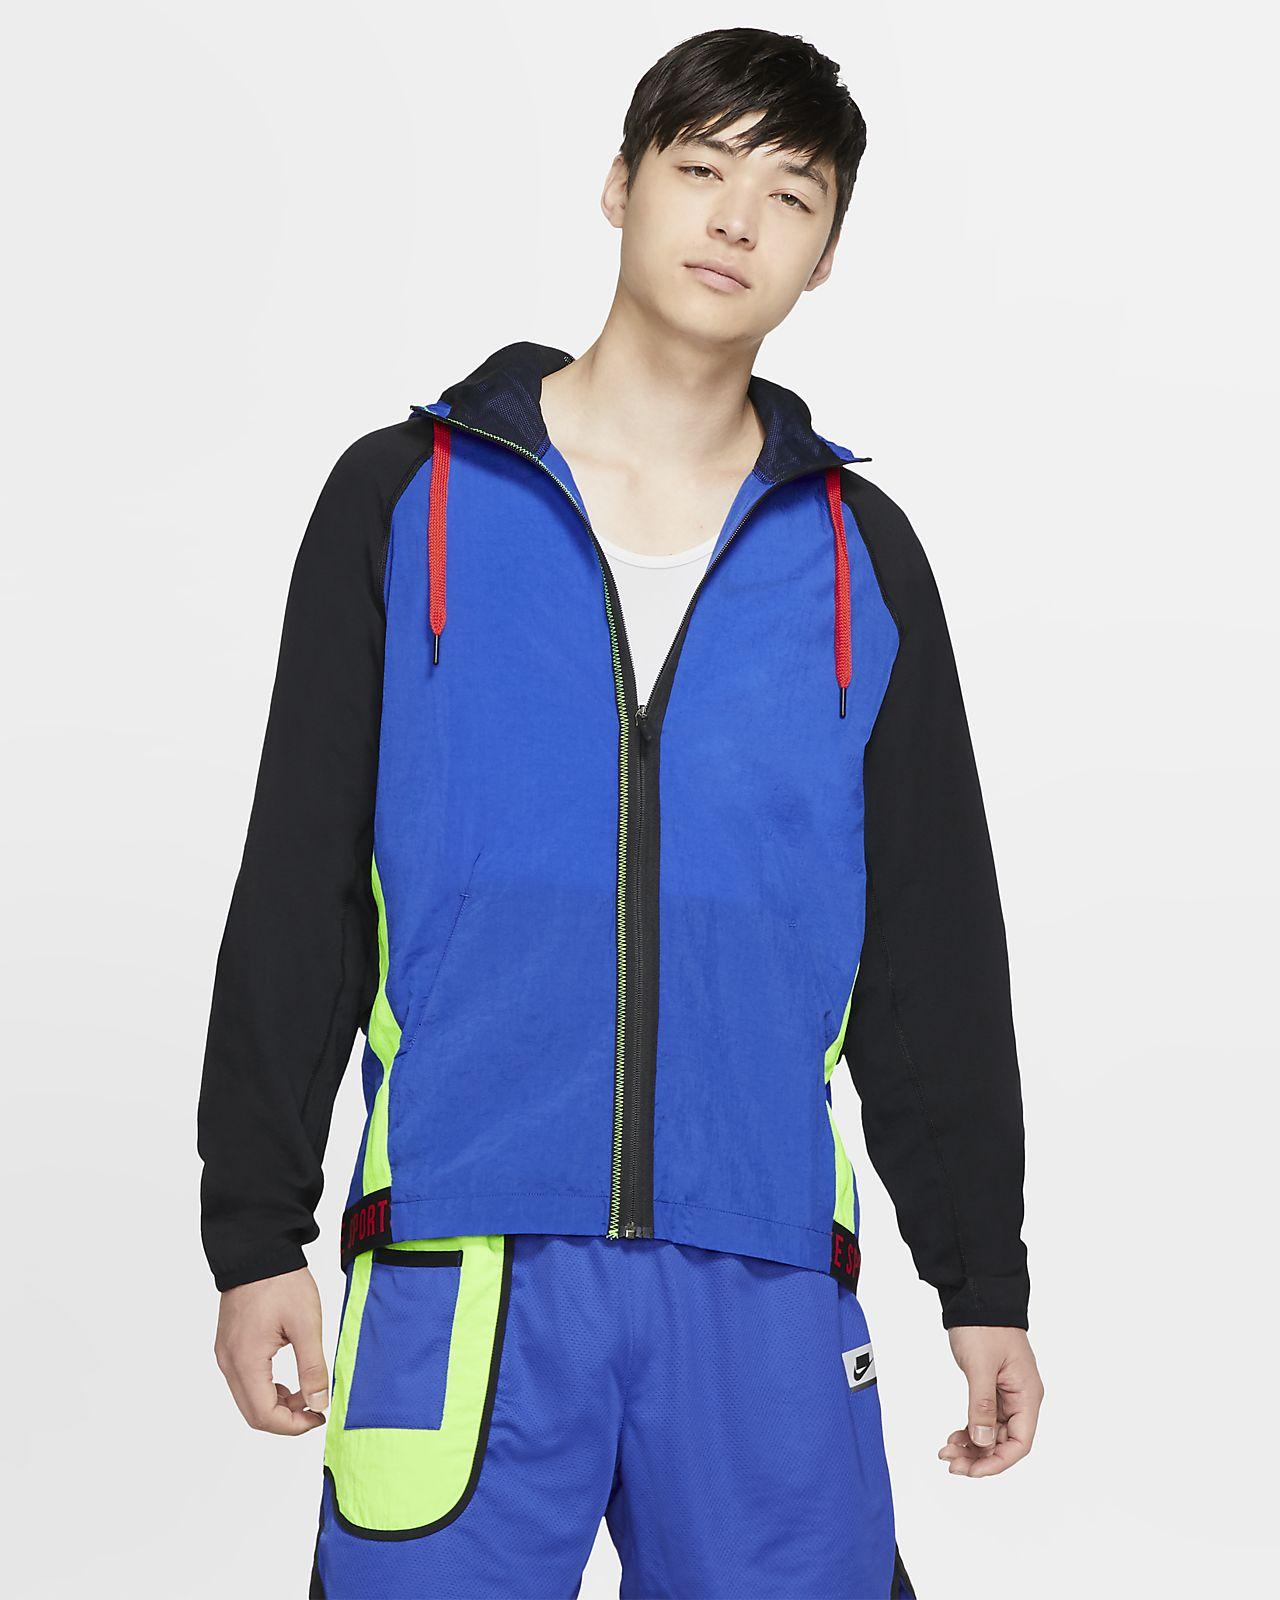 Nike Flex Men's Full-Zip Training Jacket